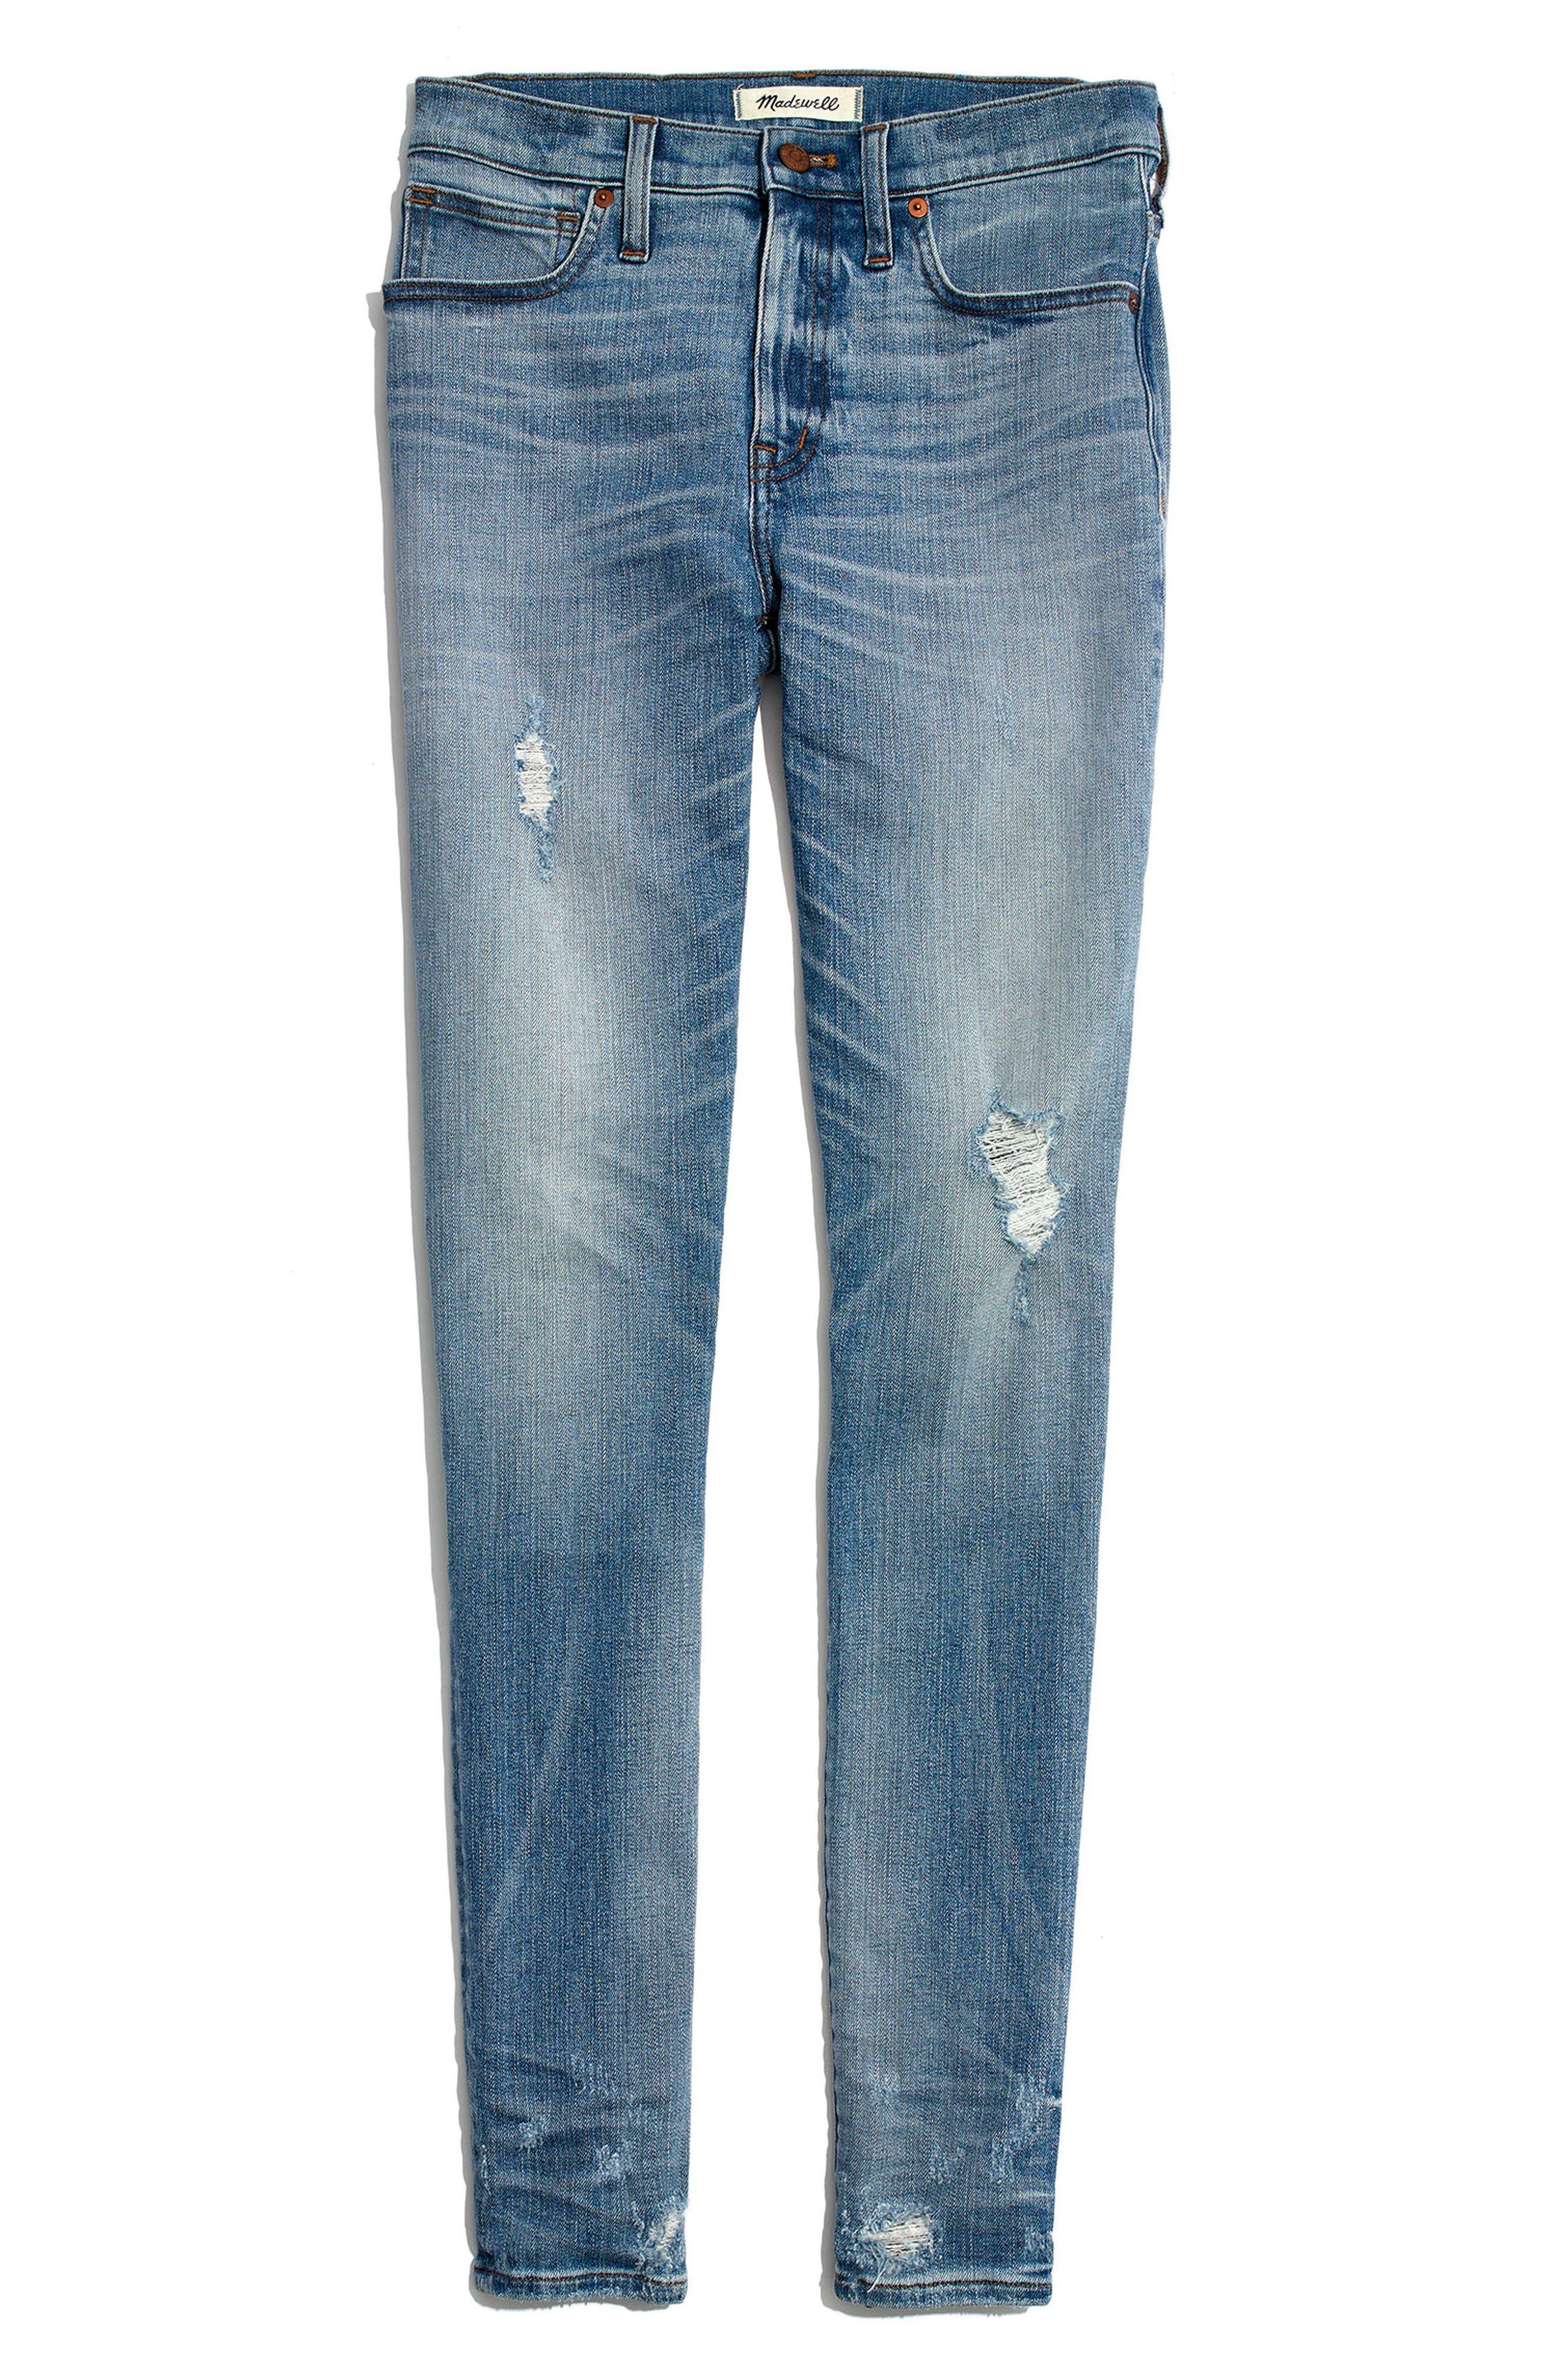 MADEWELL,                             9-Inch Destructed Hem High Waist Skinny Jeans,                             Alternate thumbnail 4, color,                             400